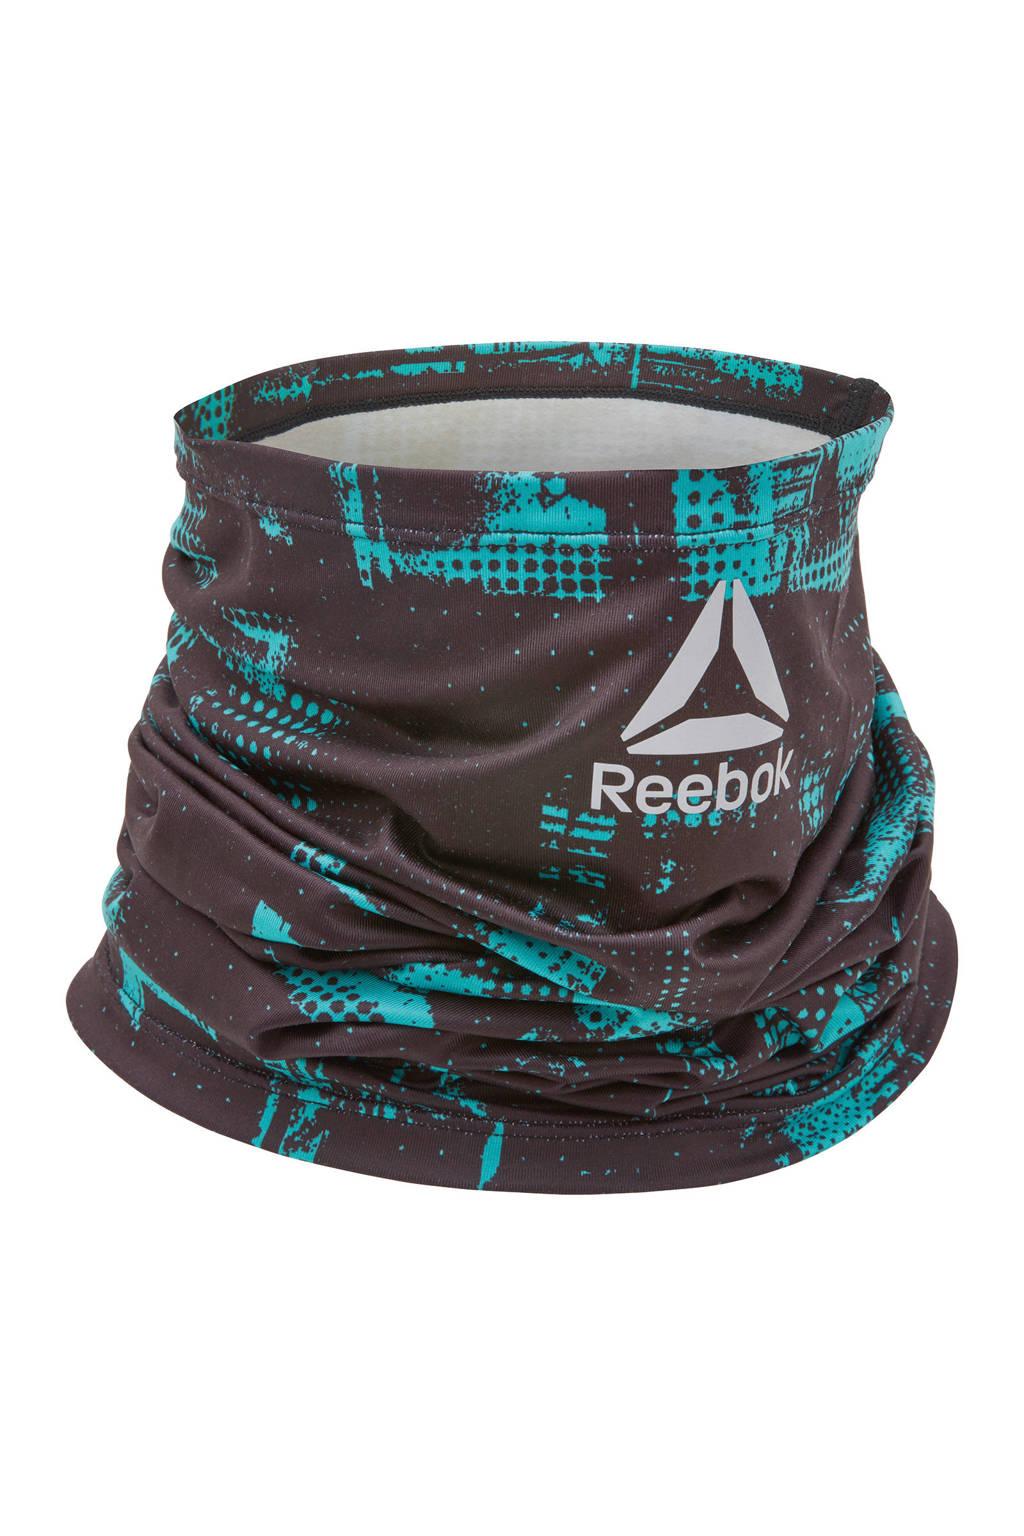 Reebok   nekwarmer geocast/zwart, Zwart/turquoise